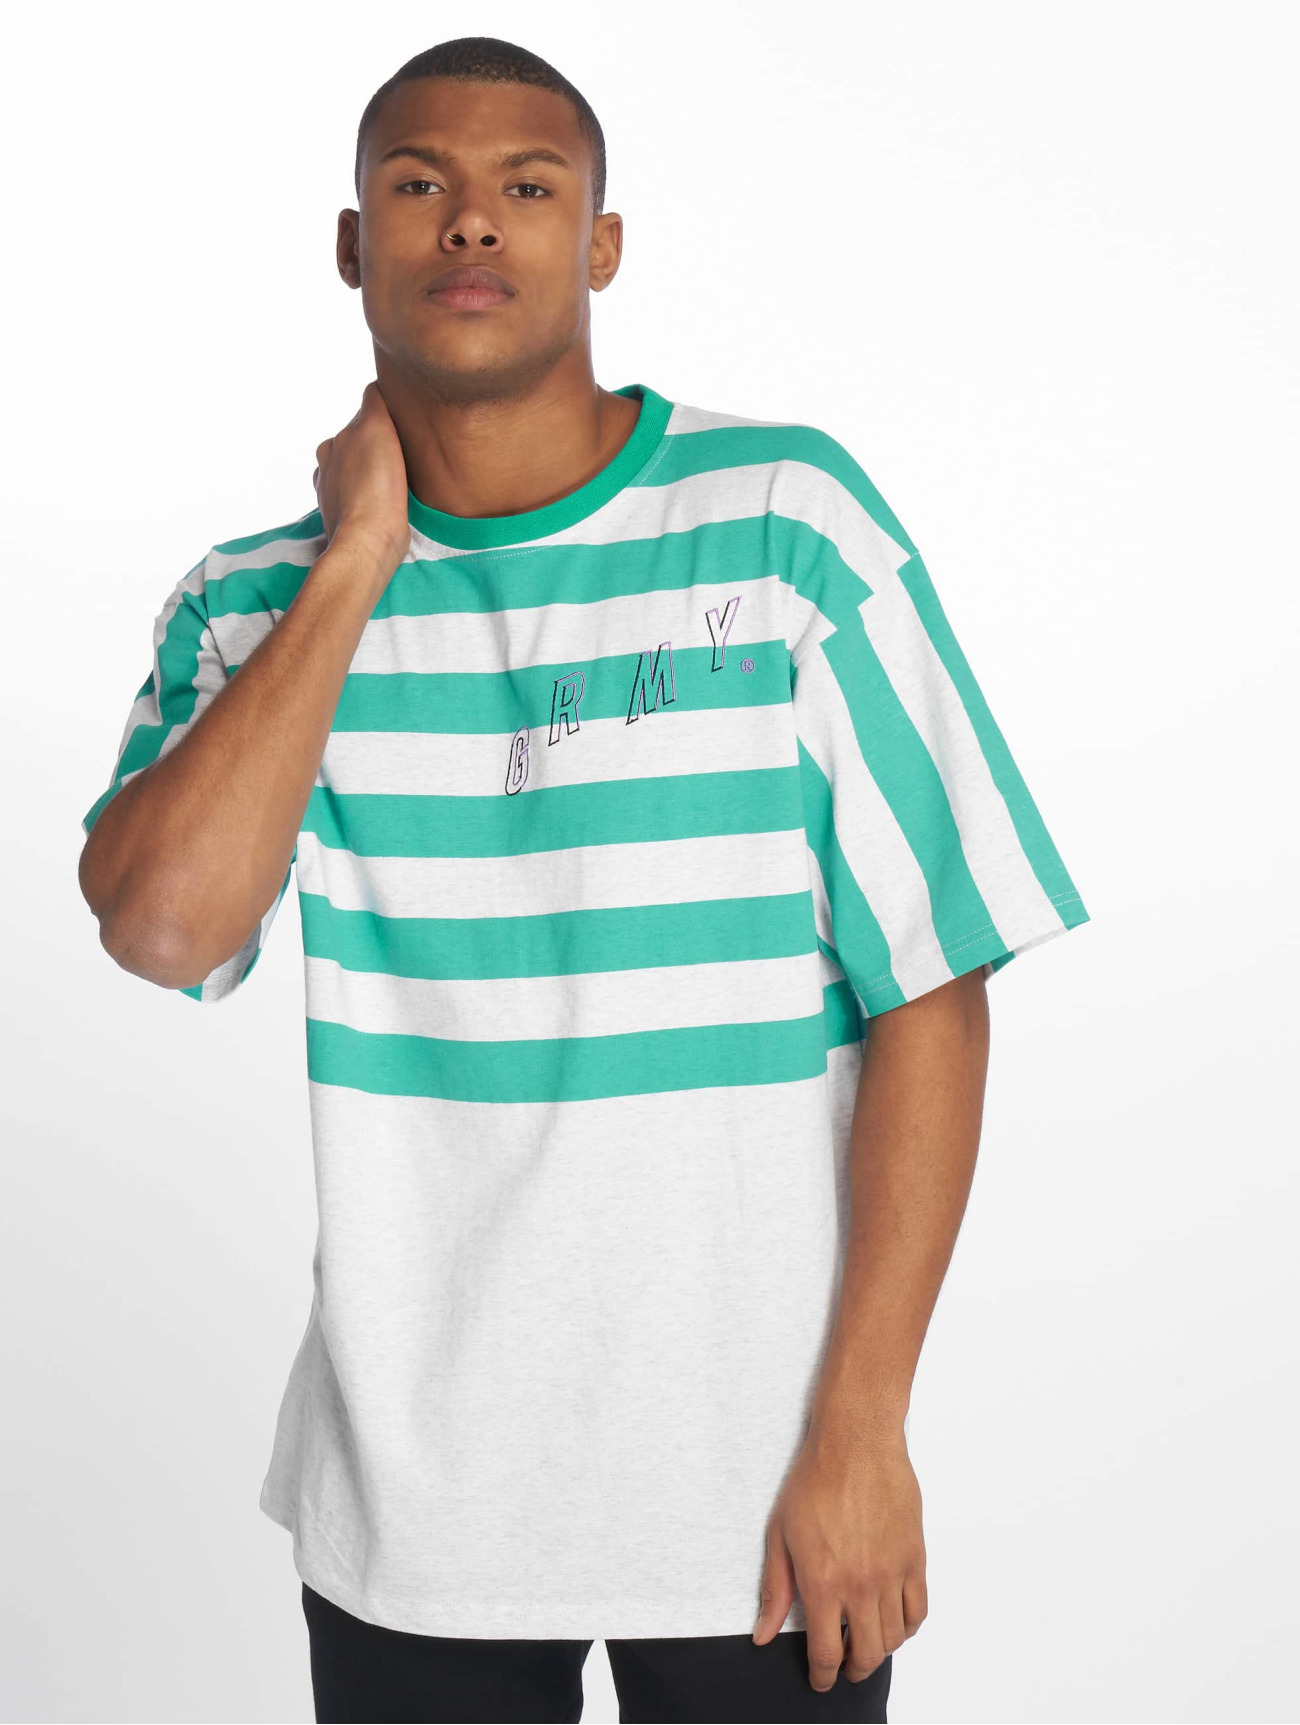 Grimey Wear Överdel / T-shirt Brick City i grön 660645 Män Överdelar